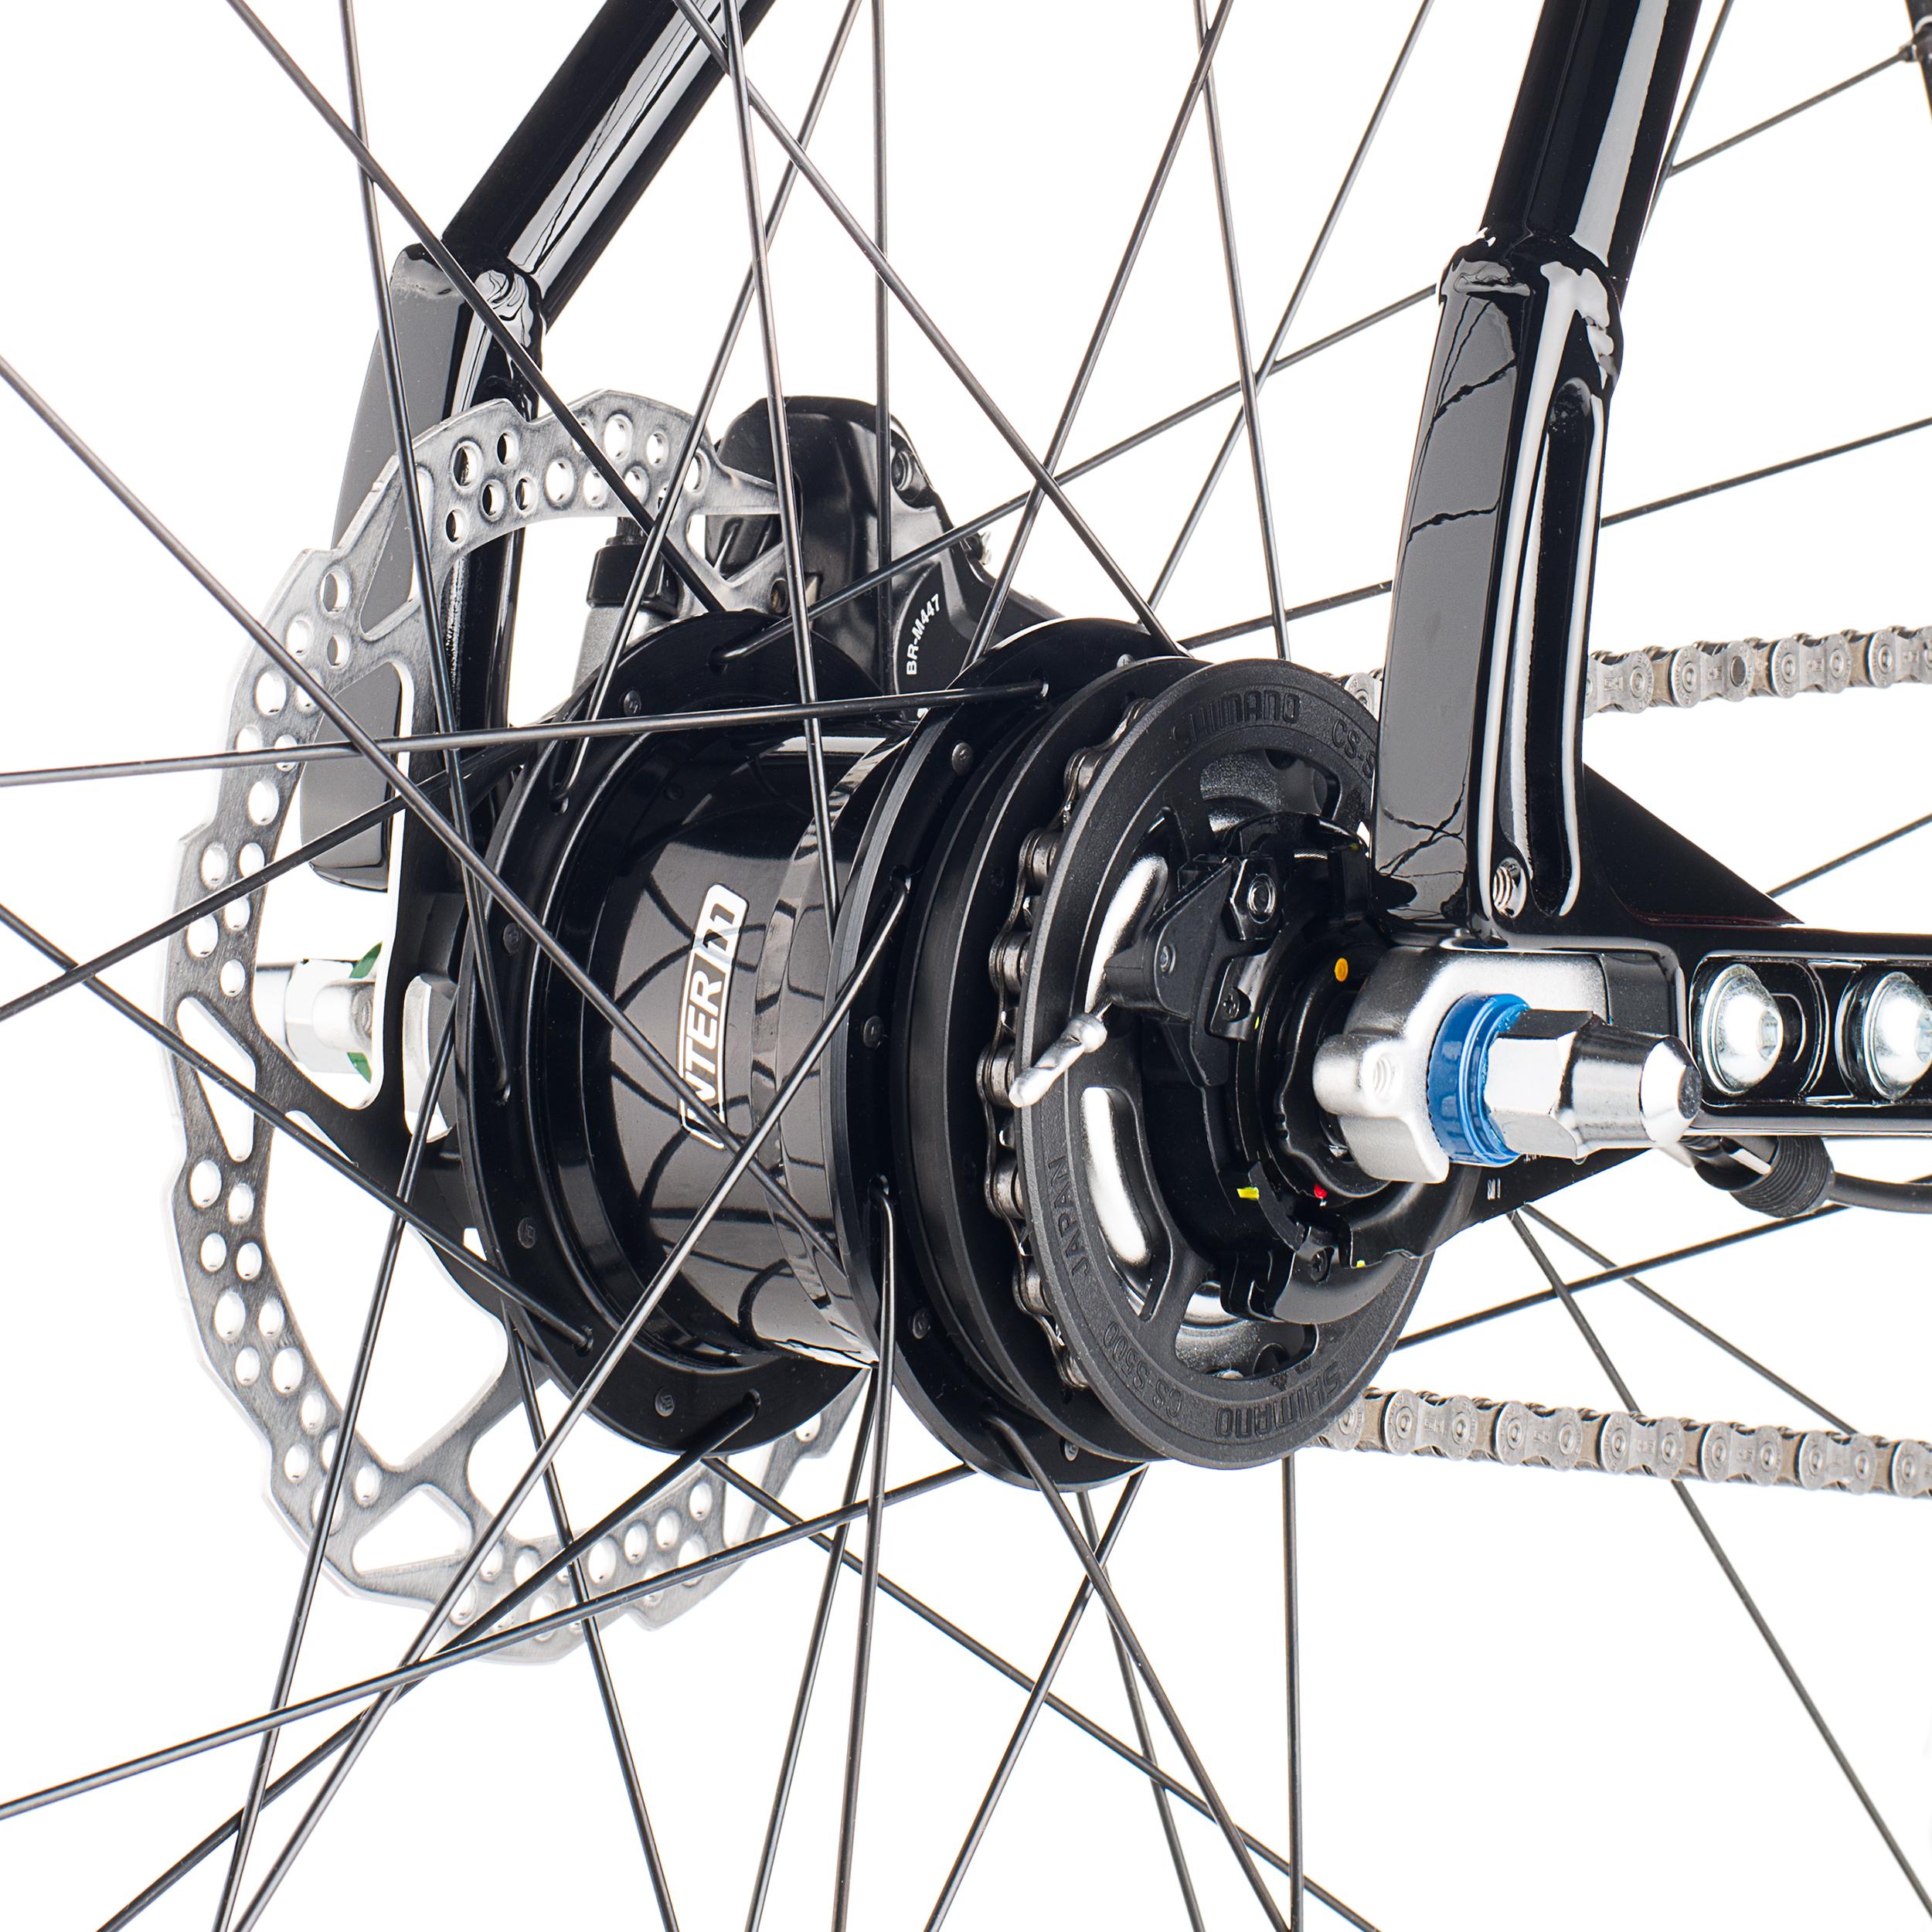 Mec Chance Bicycle Unisex